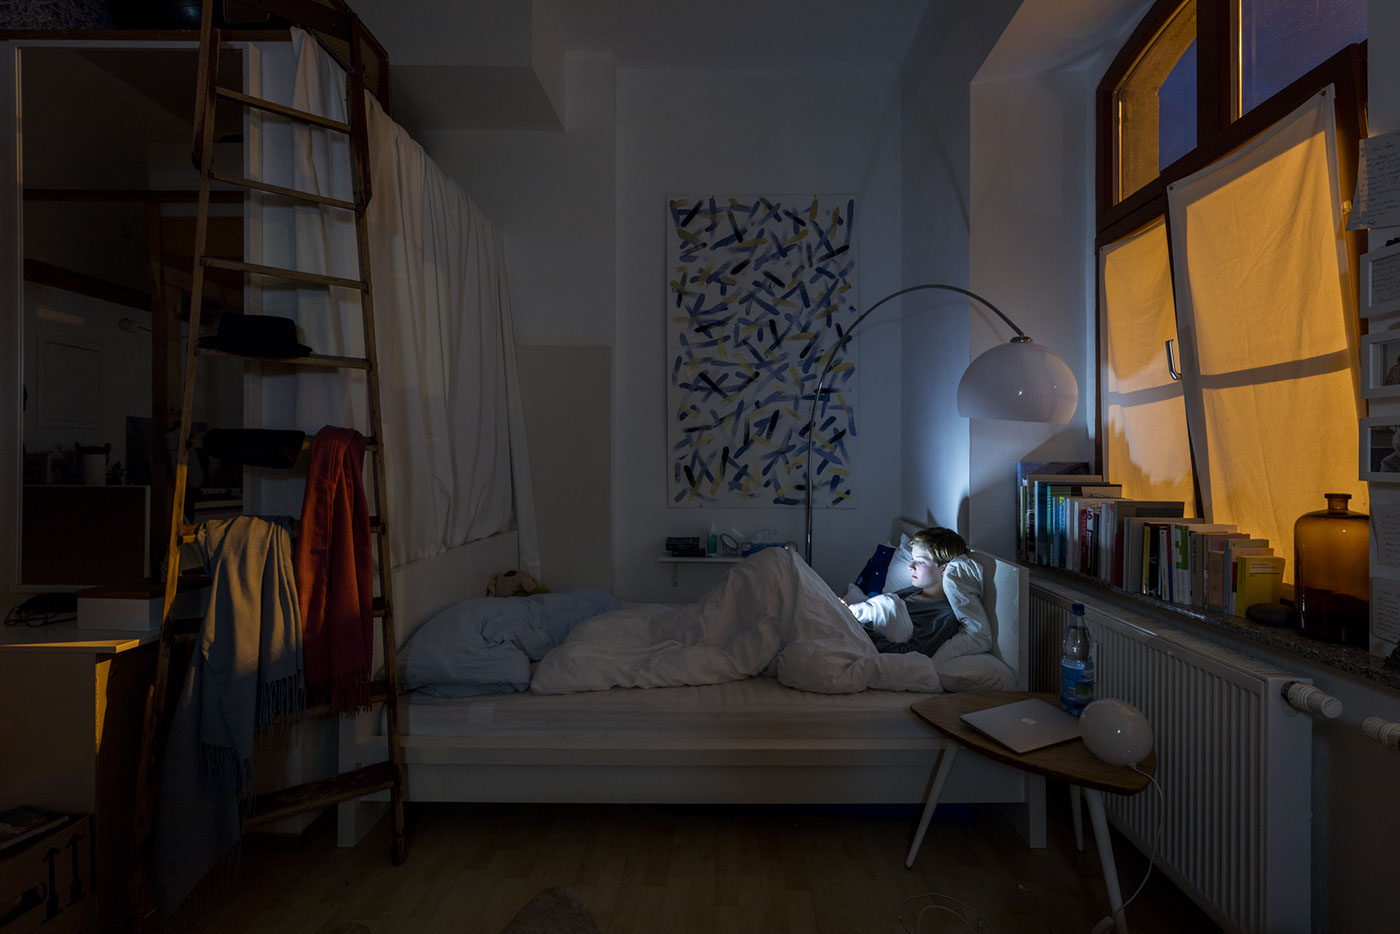 Solitude Palace / работа Lucas Zimmermann